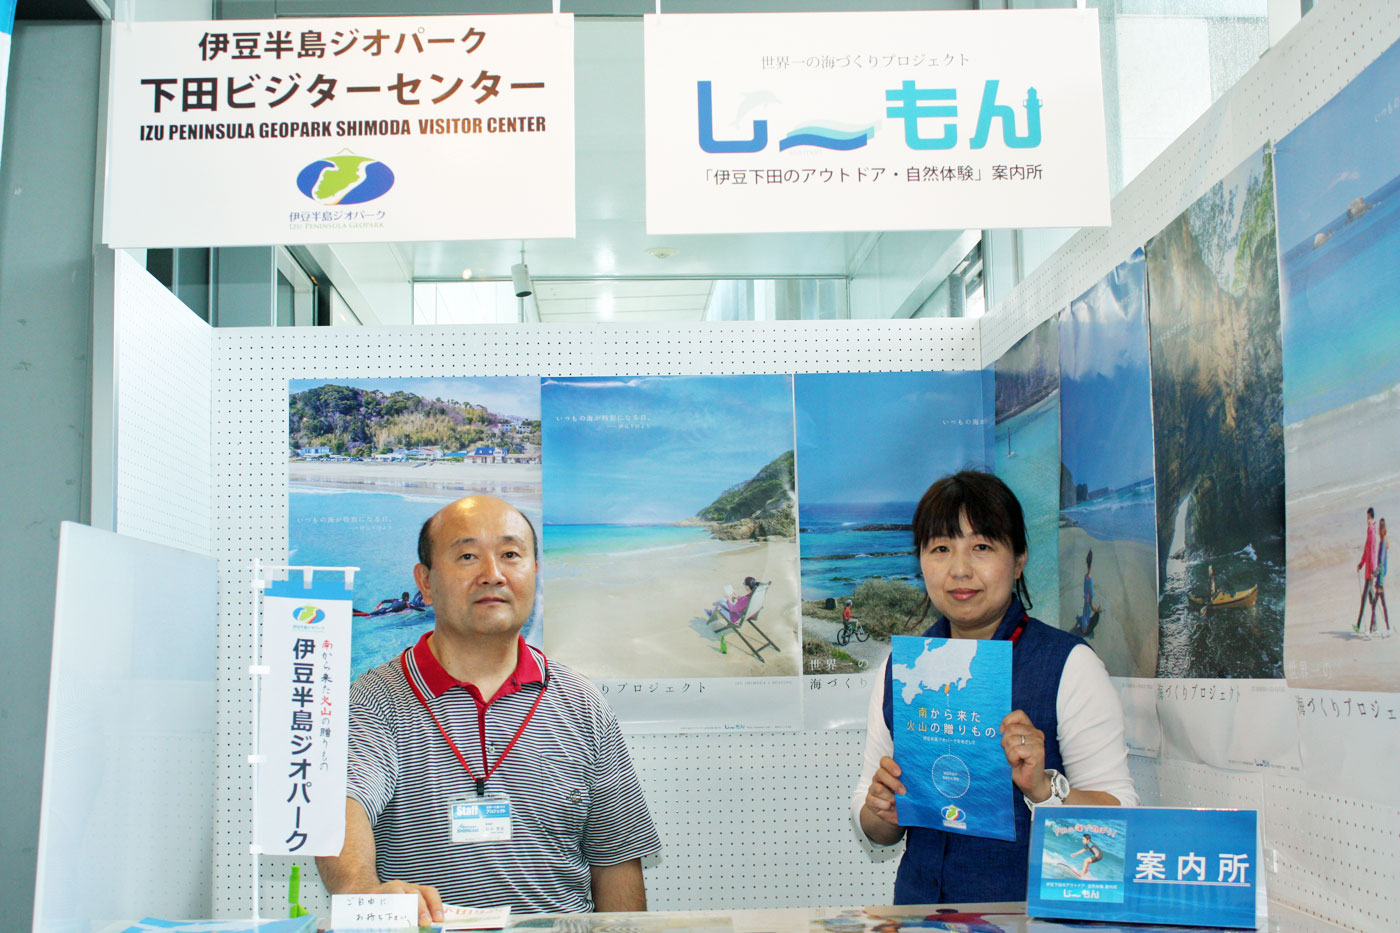 Shimoda Visitor Center